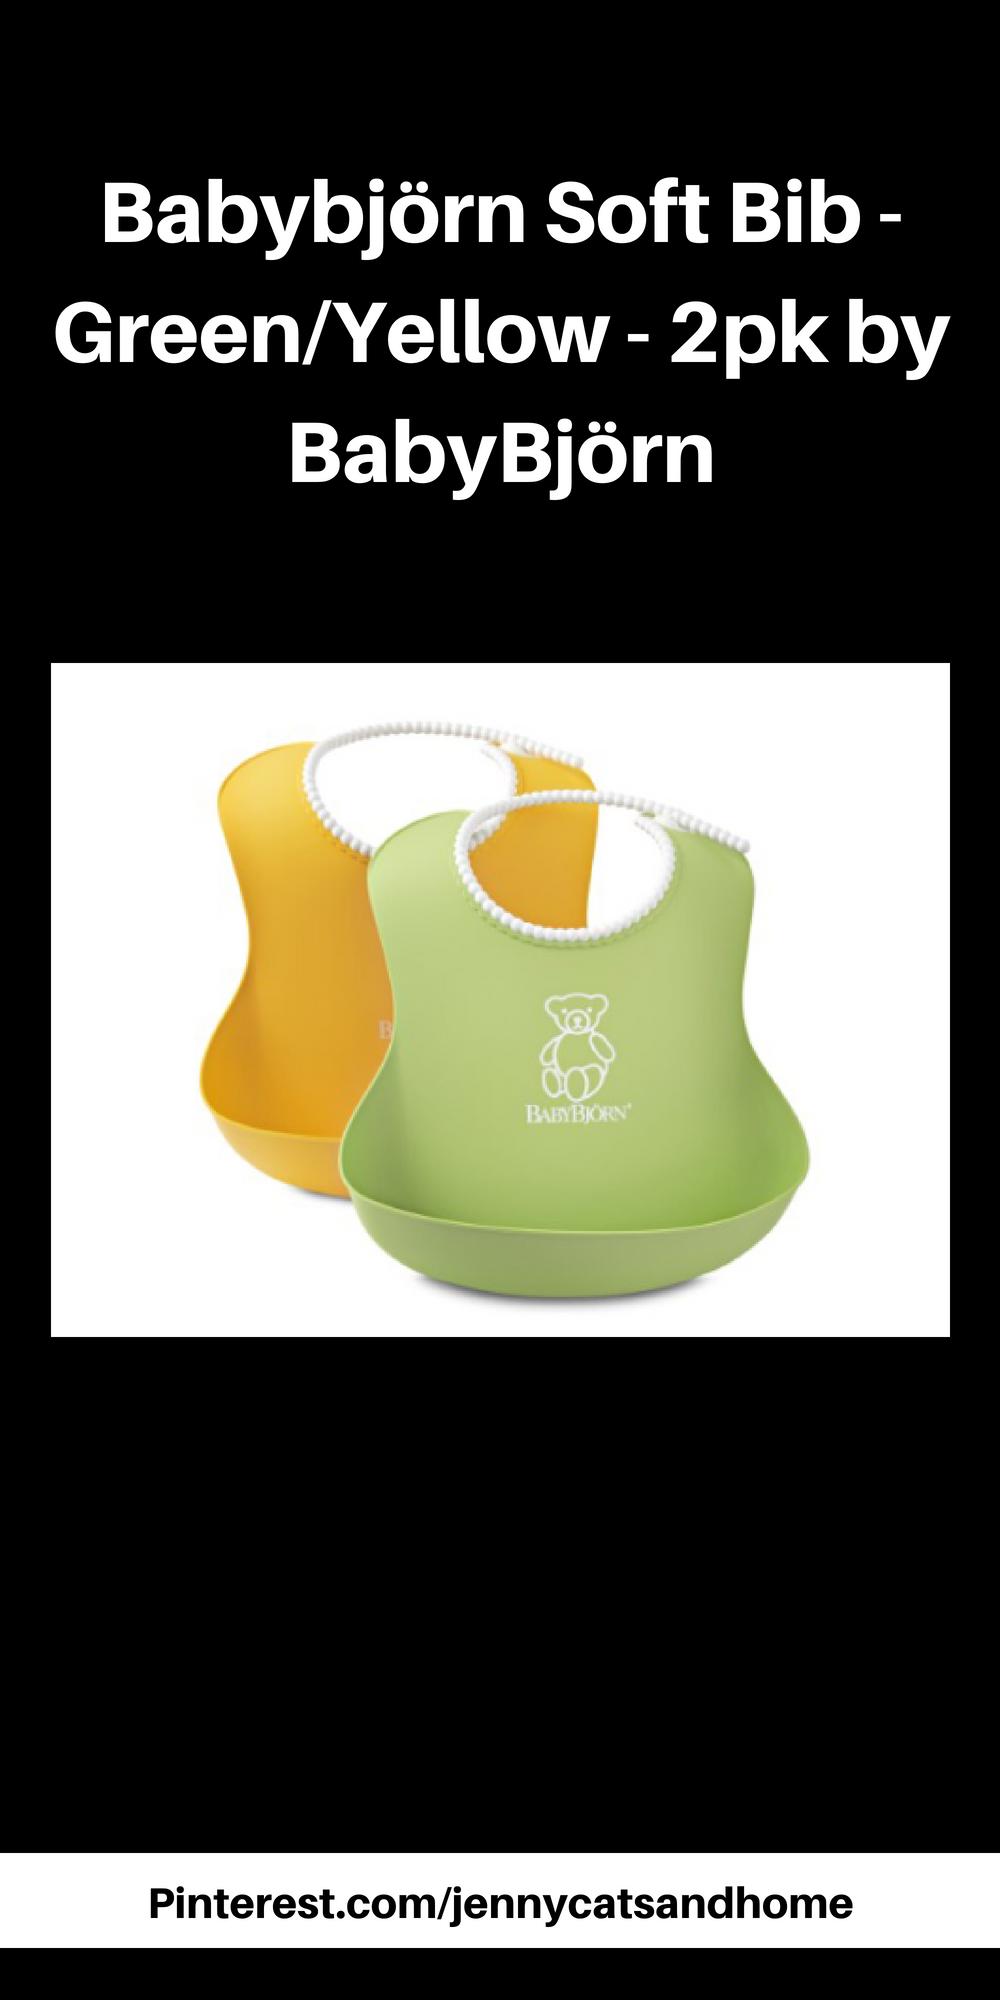 c568ea0f35e Babybjörn Soft Bib - Green Yellow - 2pk by BabyBjörn  afflink. These are  the best bibs ever